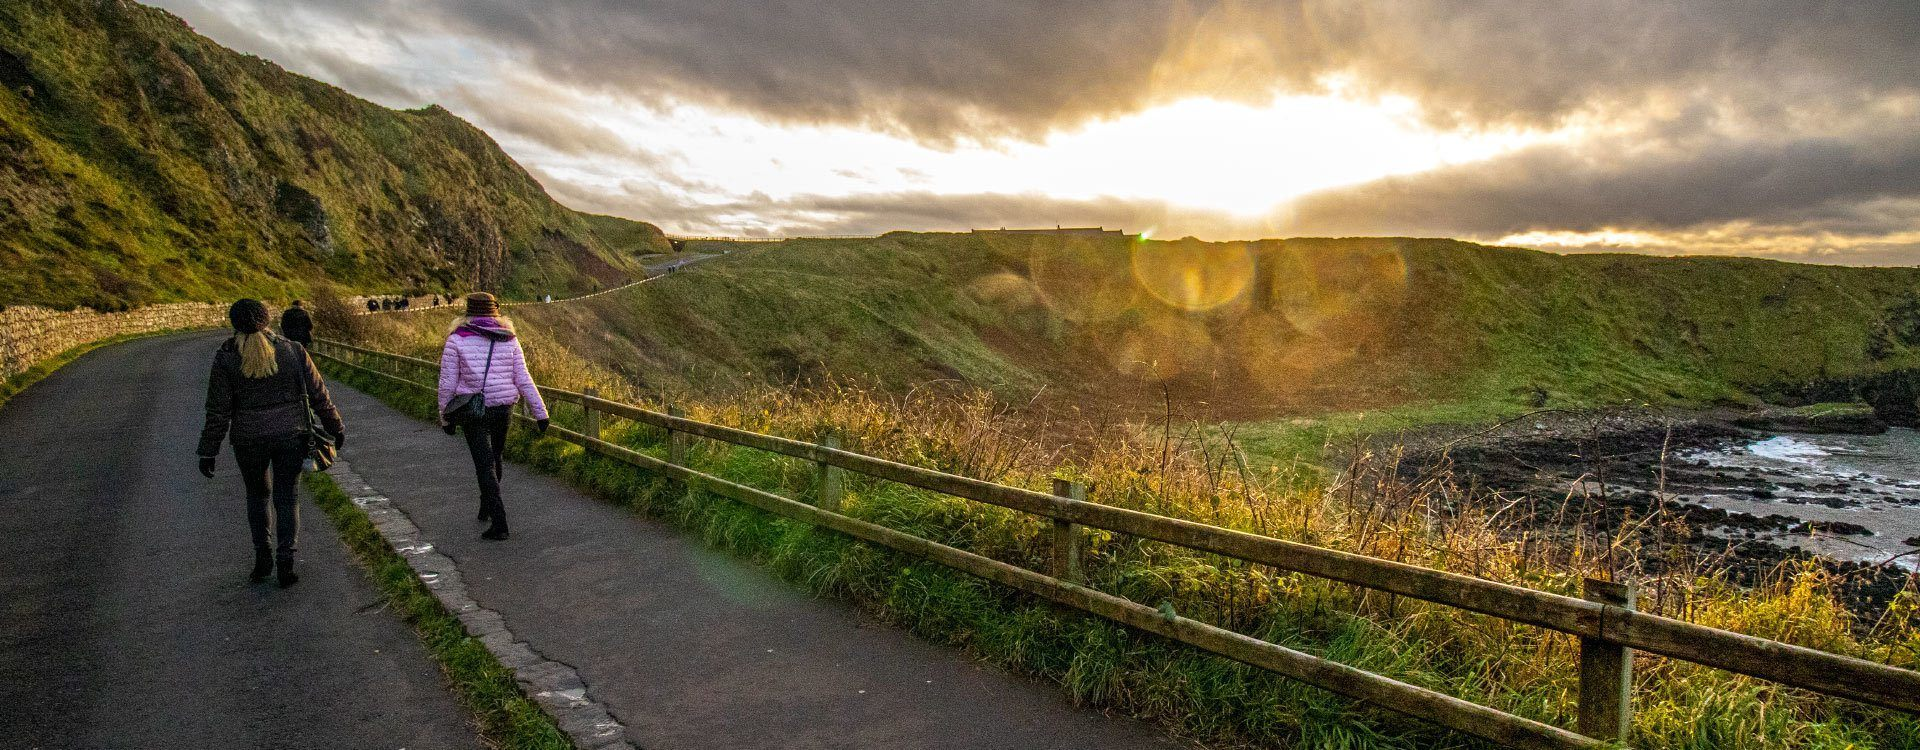 Excursión de dos días a Irlanda del Norte desde Dublín